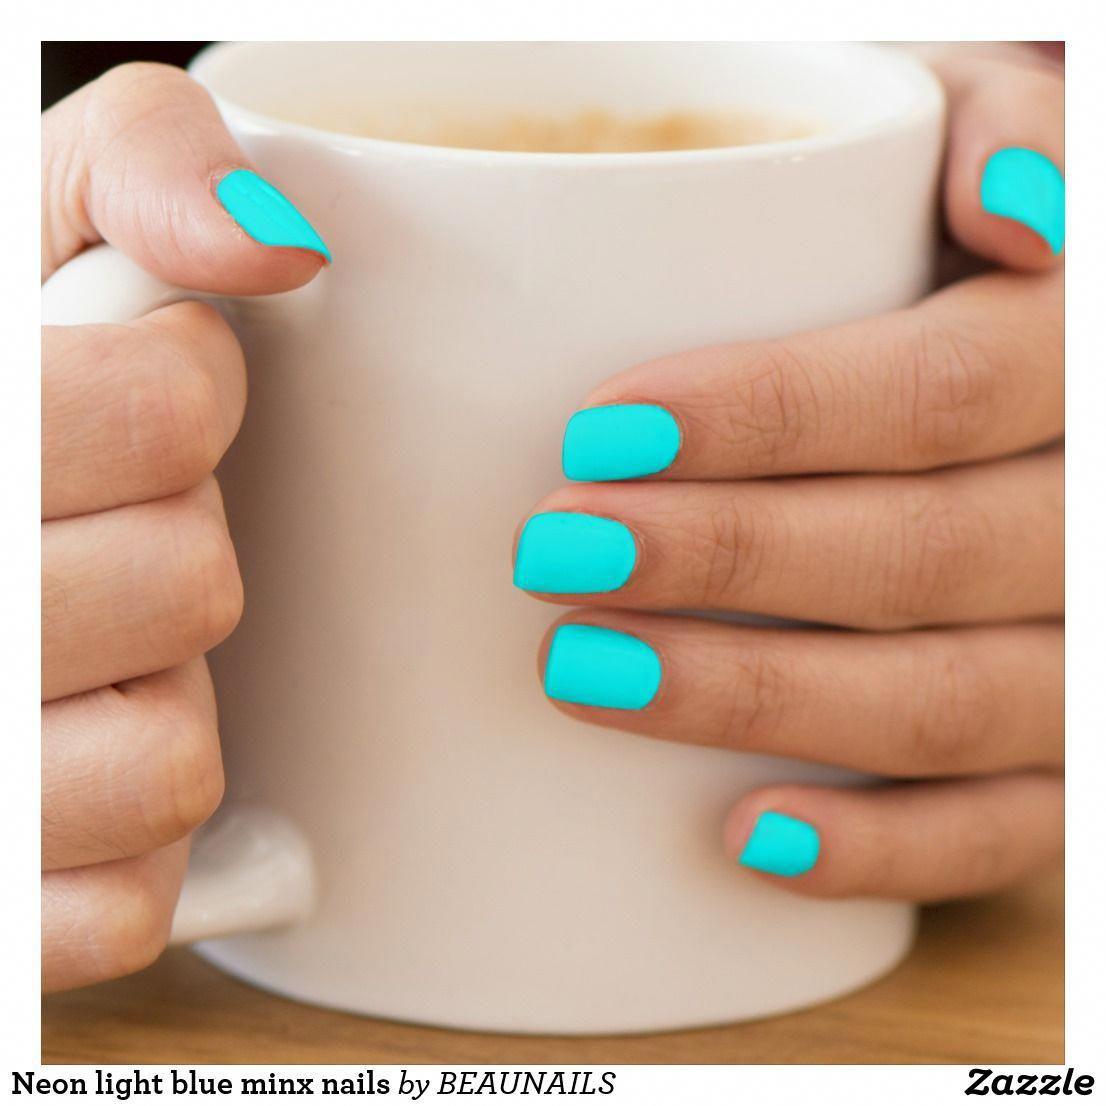 Neon light blue minx nails minx nail art | Zazzle.com